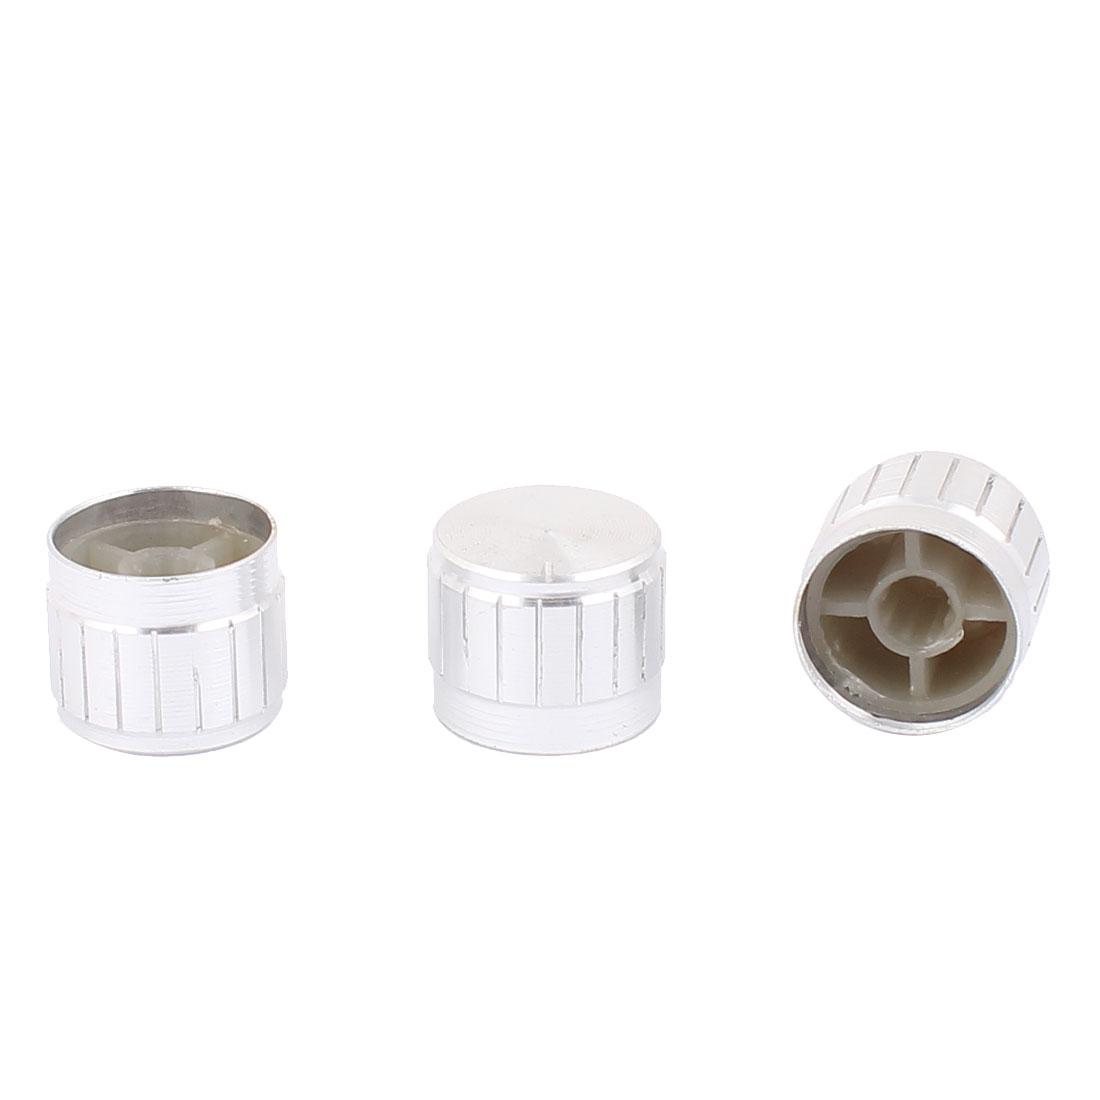 3 Pcs 21mm x 6mm Aluminium Alloy Potentiometer Control Knob Mini Cap Knurled Button Silver Tone